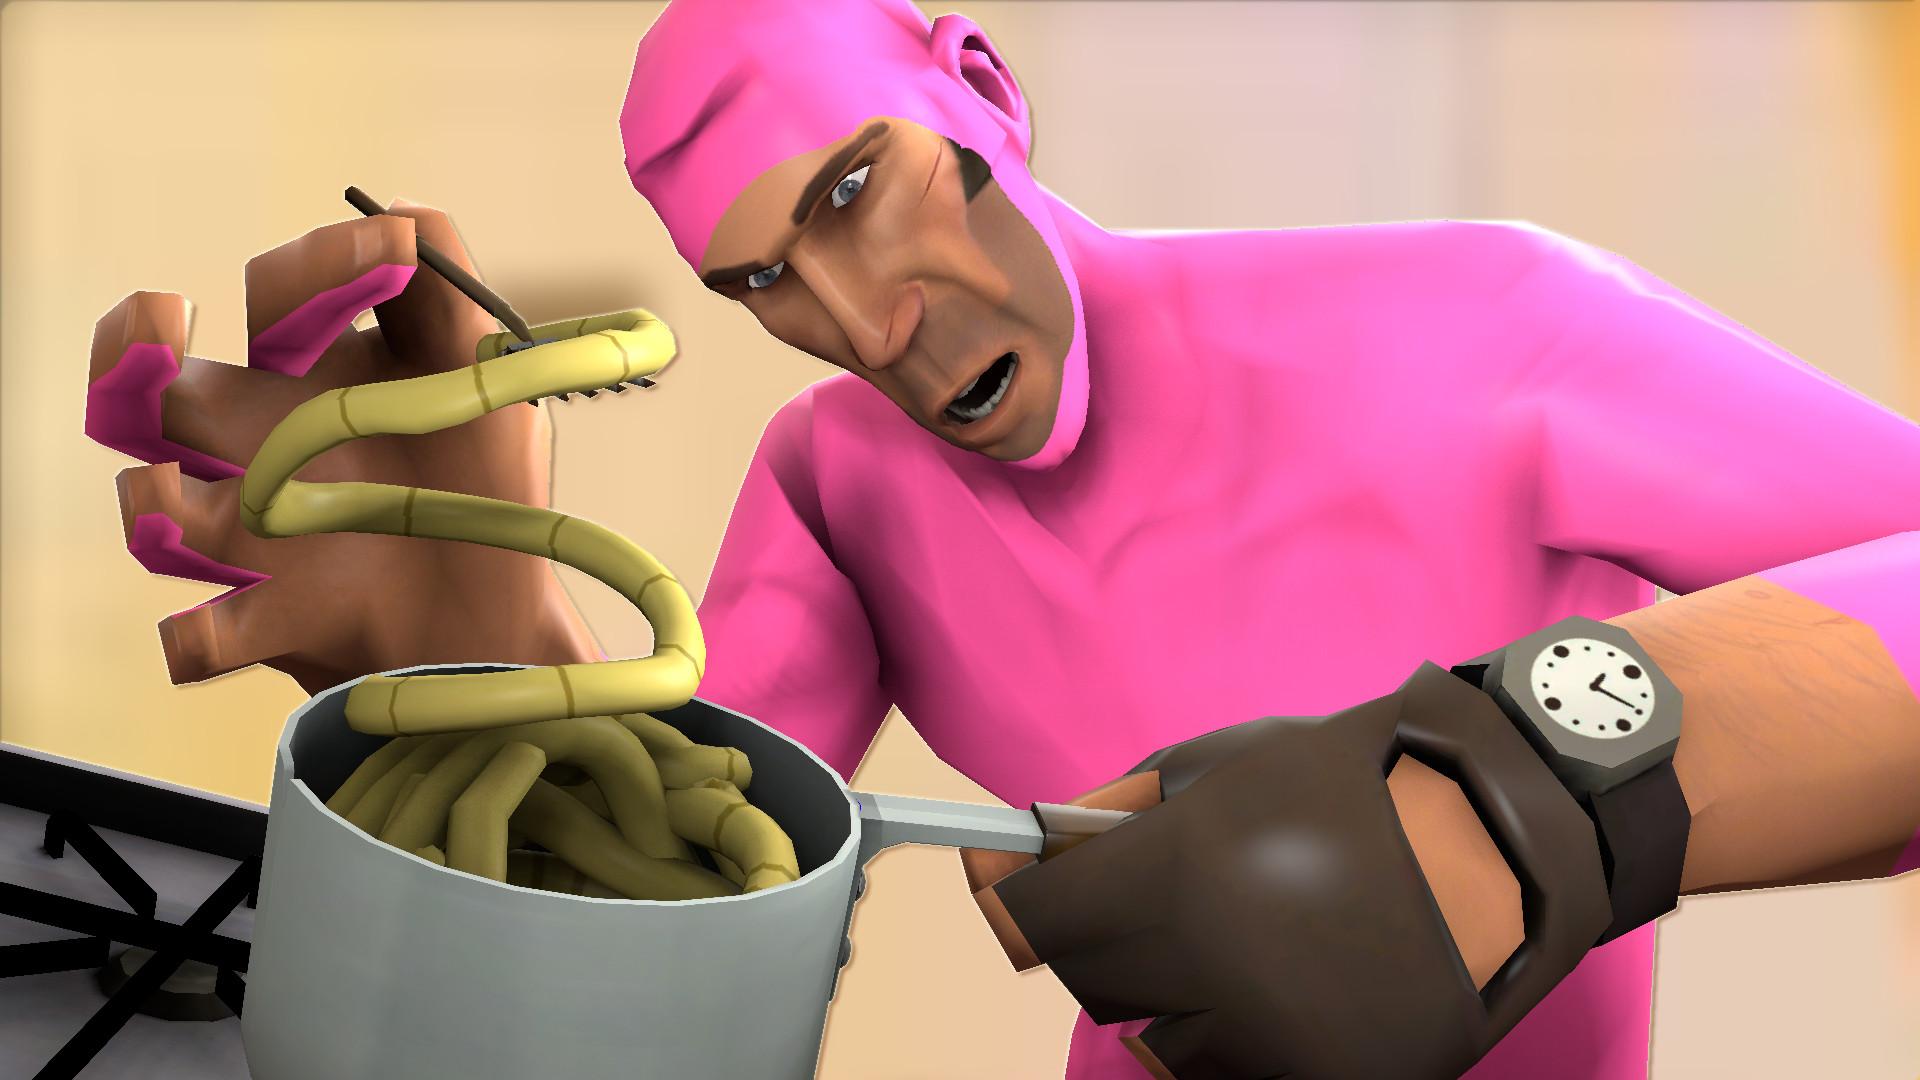 … PaulPatrickBandico0t PINK GUY COOKS RAMEN AND RAPS (Pink Guy Cover) by  PaulPatrickBandico0t